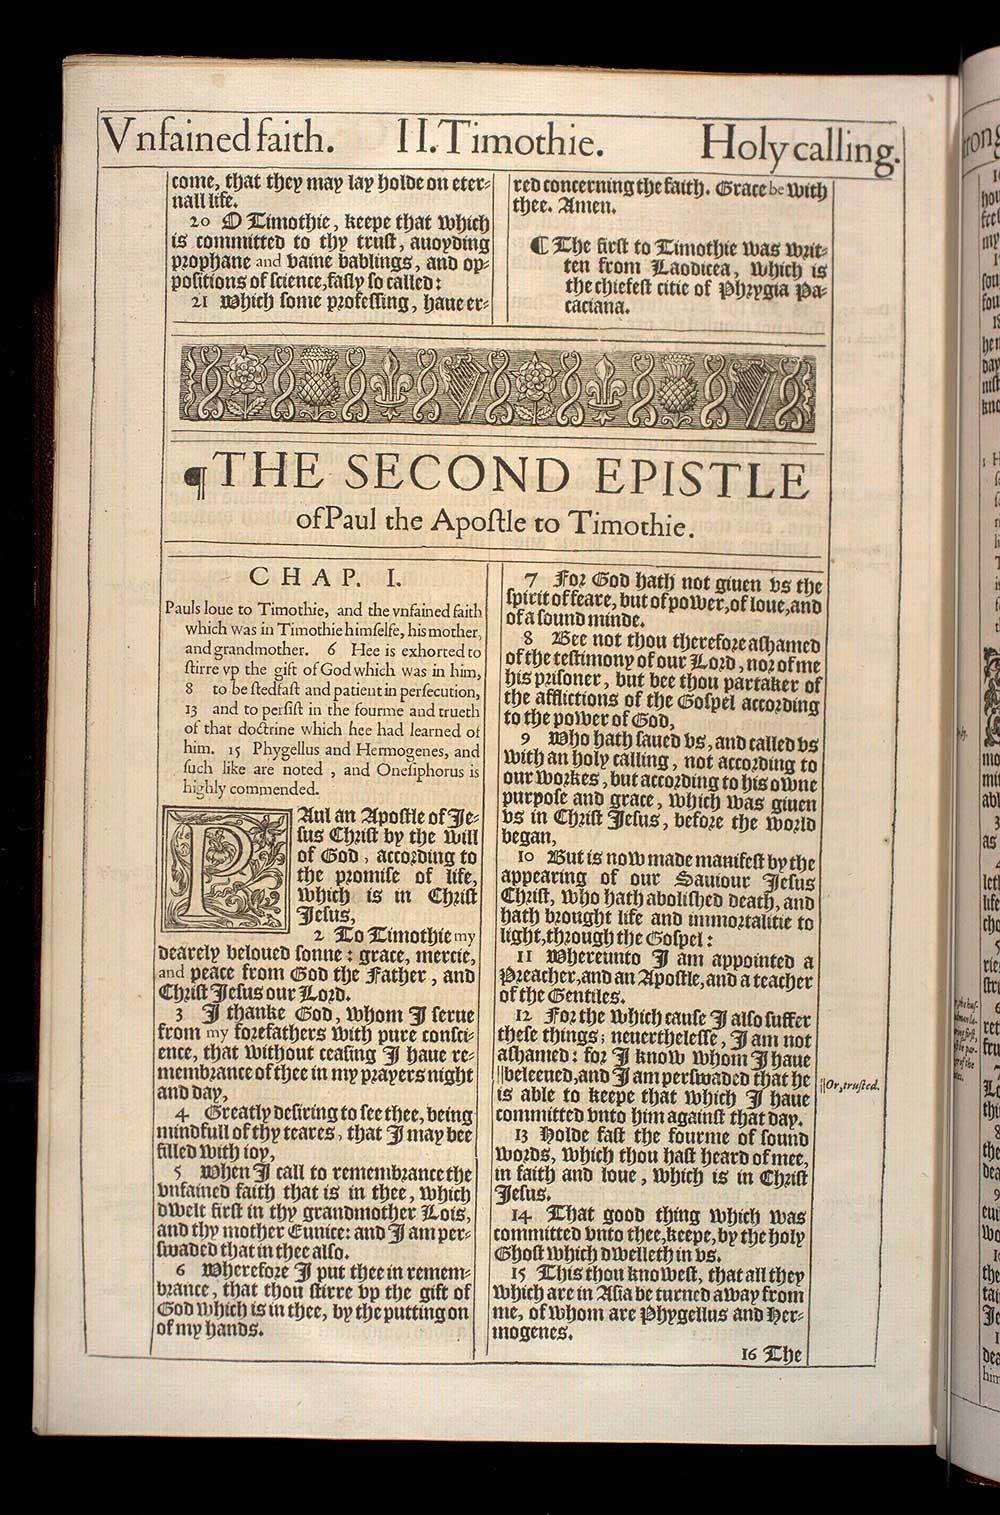 2 Timothy Chapter 1 Original 1611 Bible Scan